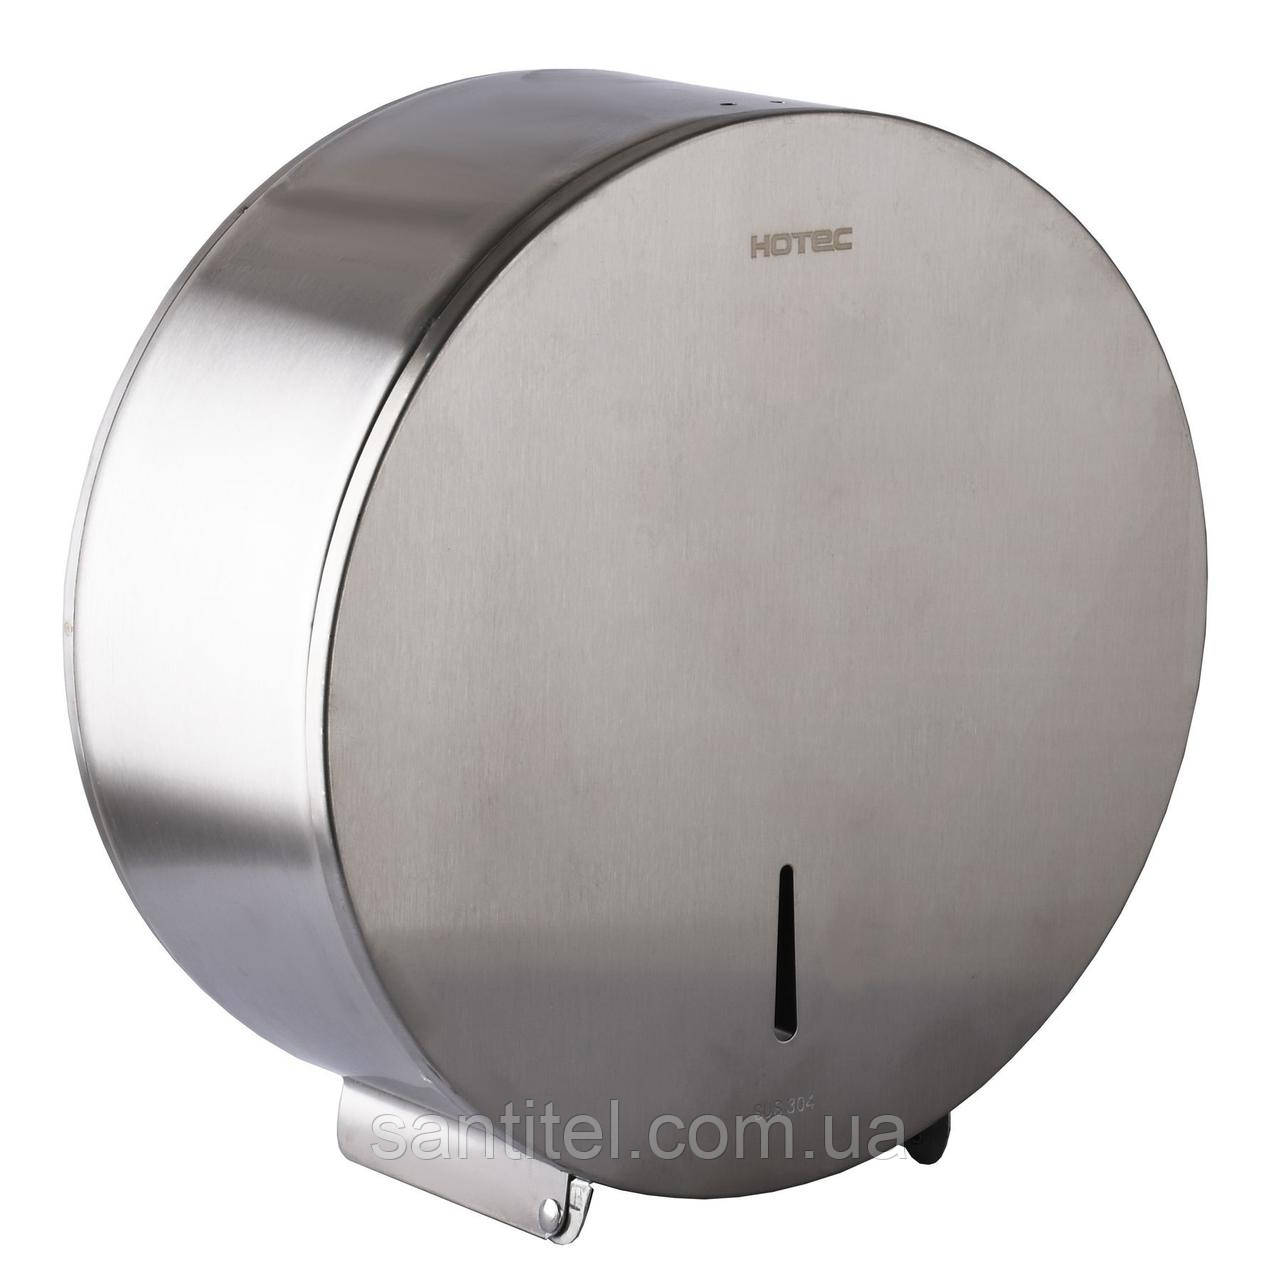 Диспенсер для туалетного паперу HOTEC 14.101 Stainless Steel